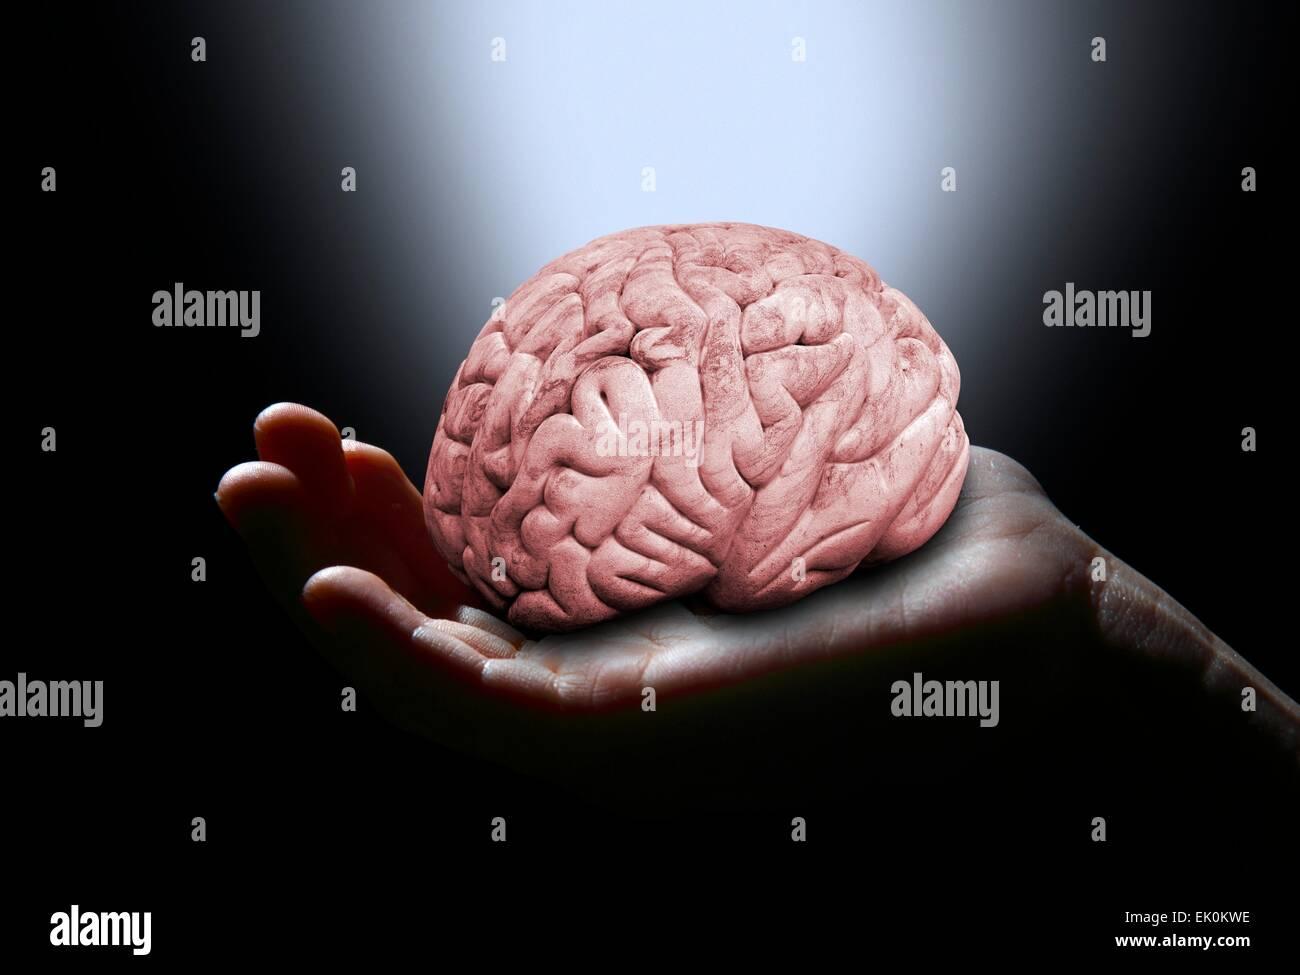 Brain Hand Stockfotos & Brain Hand Bilder - Alamy